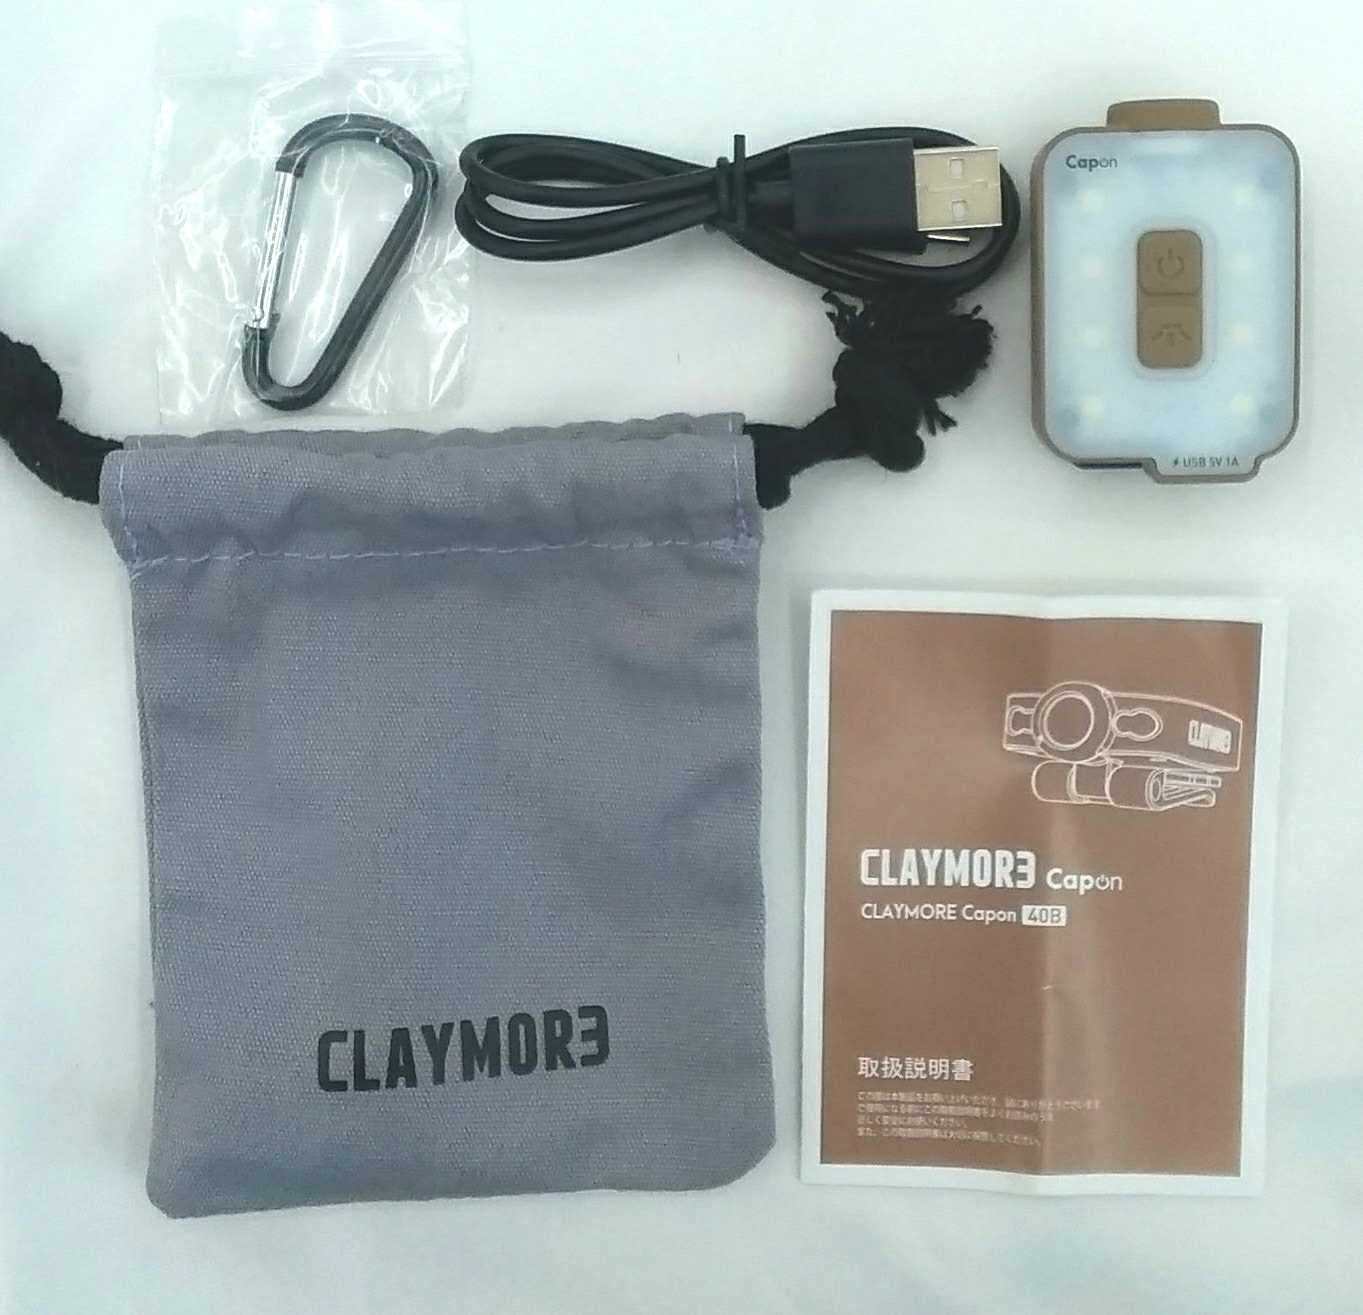 CLAYMORE CAPON 40B|PRISM